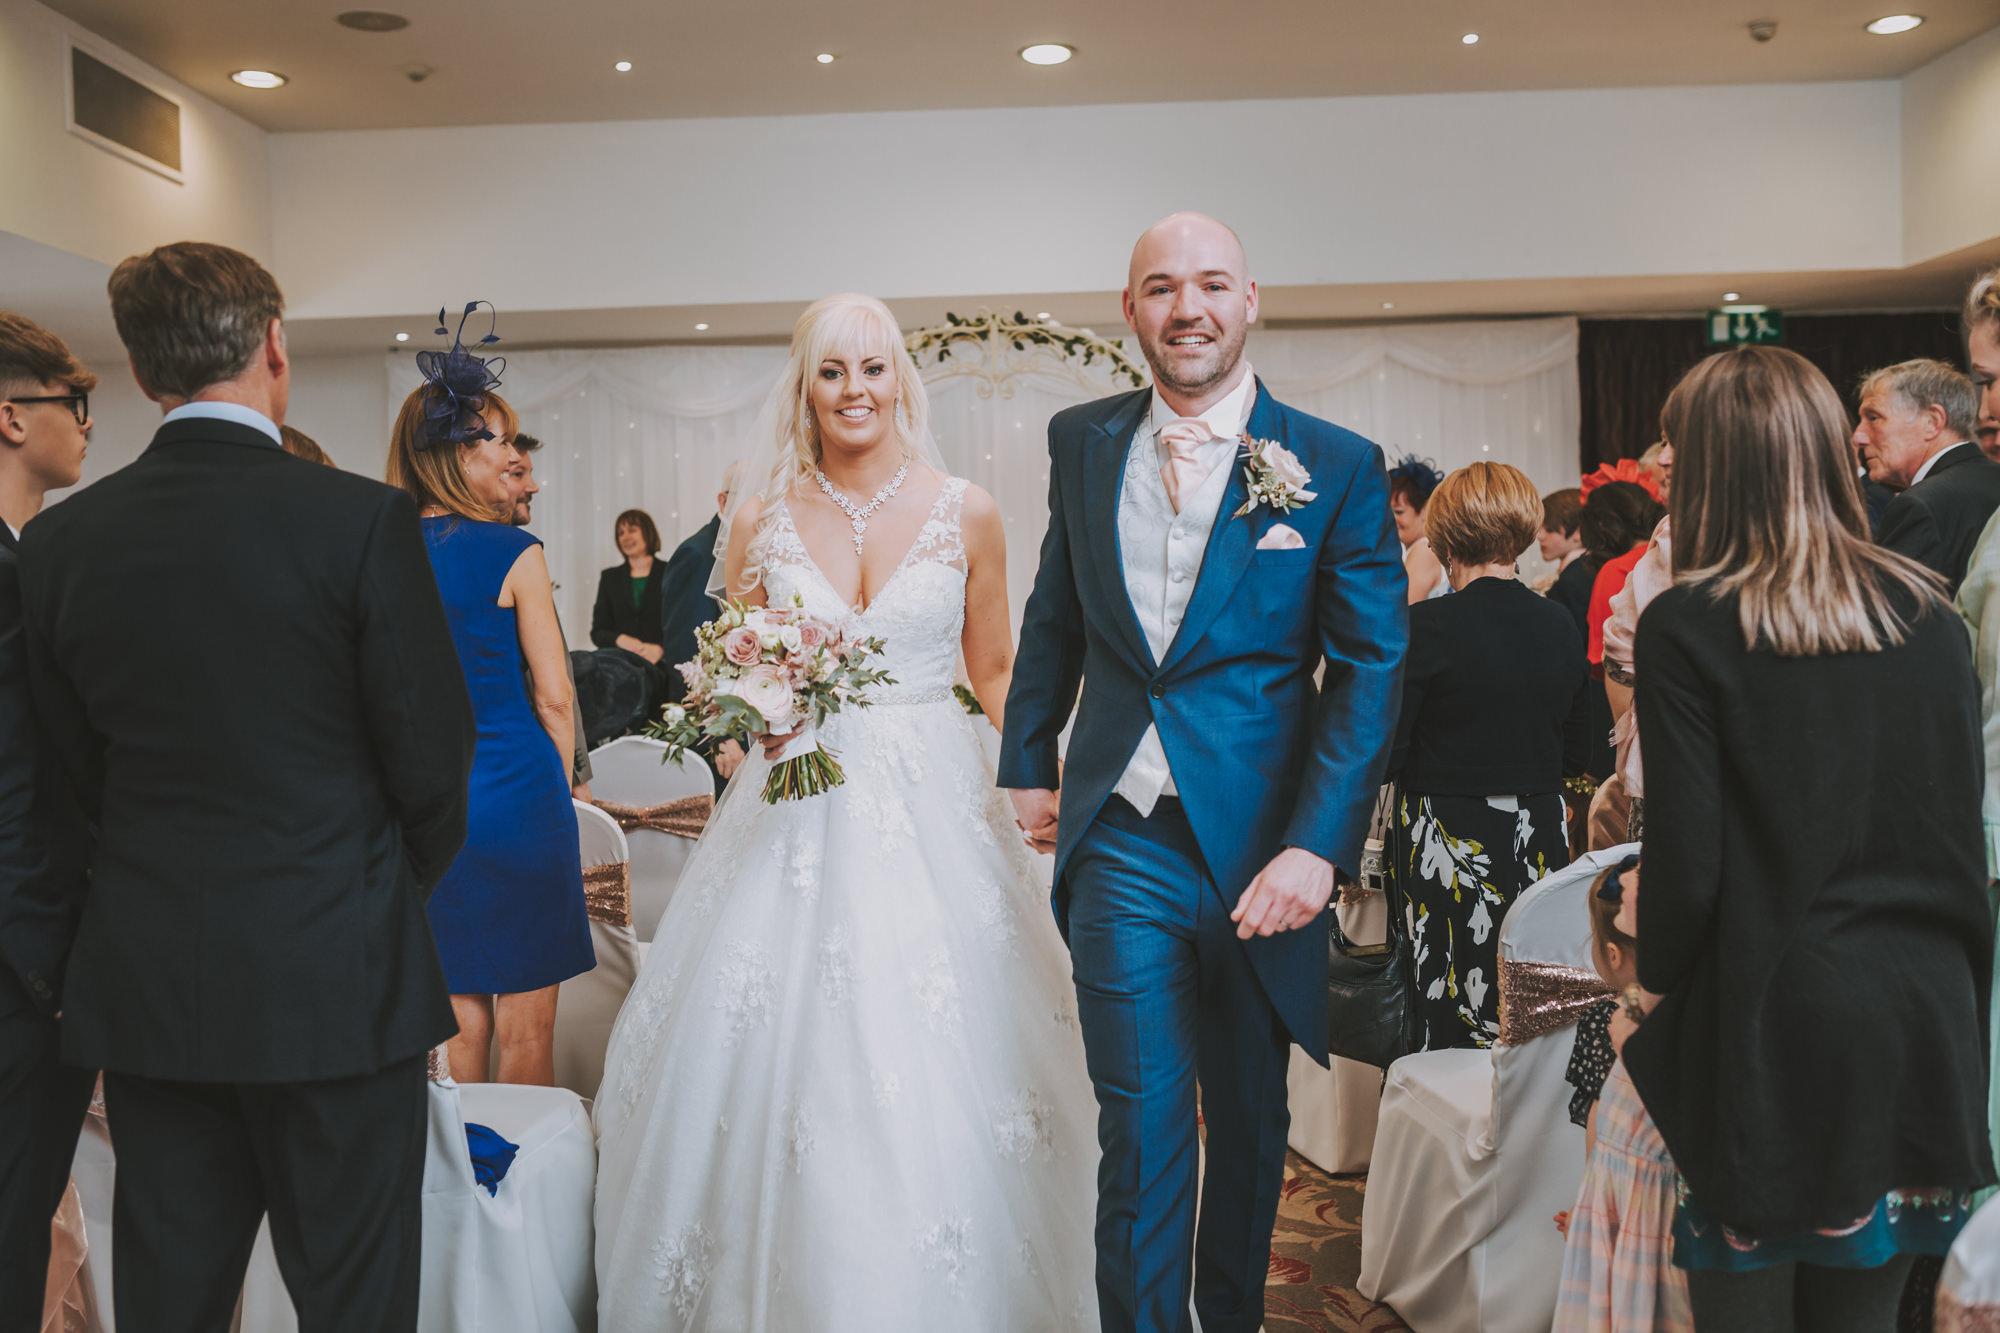 hellaby hall wedding photographers in rotherham, yorkshire-37.jpg